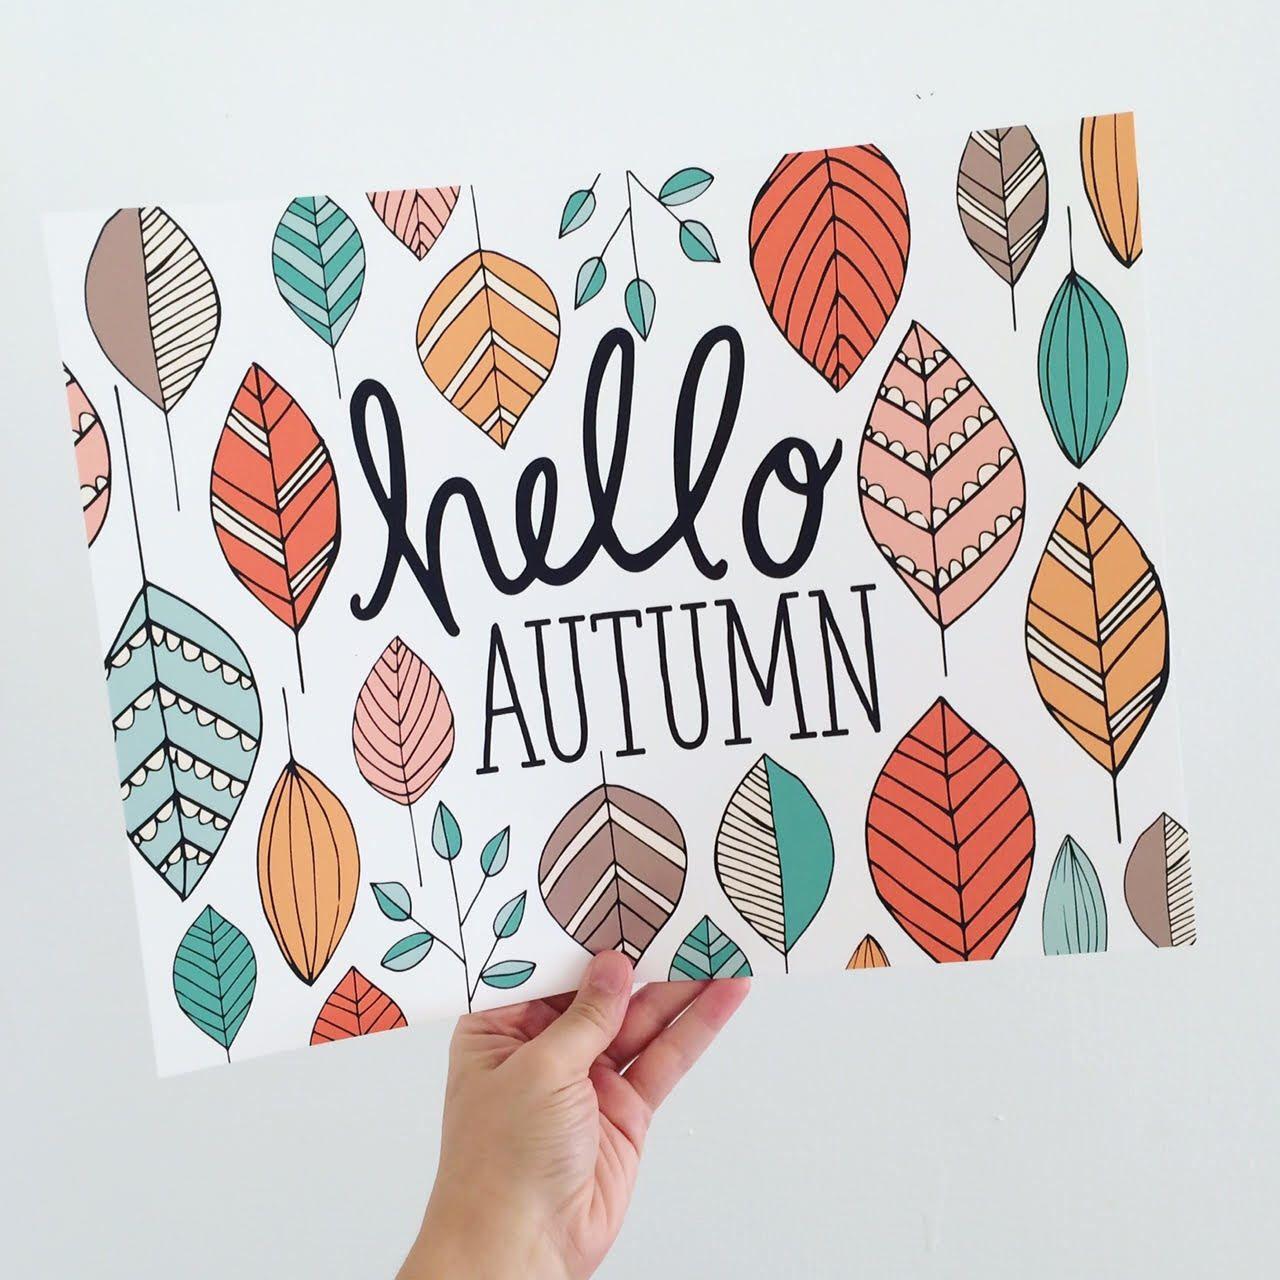 Photo of Fall Art, Fall decor, Hello Autumn, Happy Fall, Seasonal, Give Thanks, Thanksgiving, Autumn Leaves, Fall Decoration, acorns, Art Print